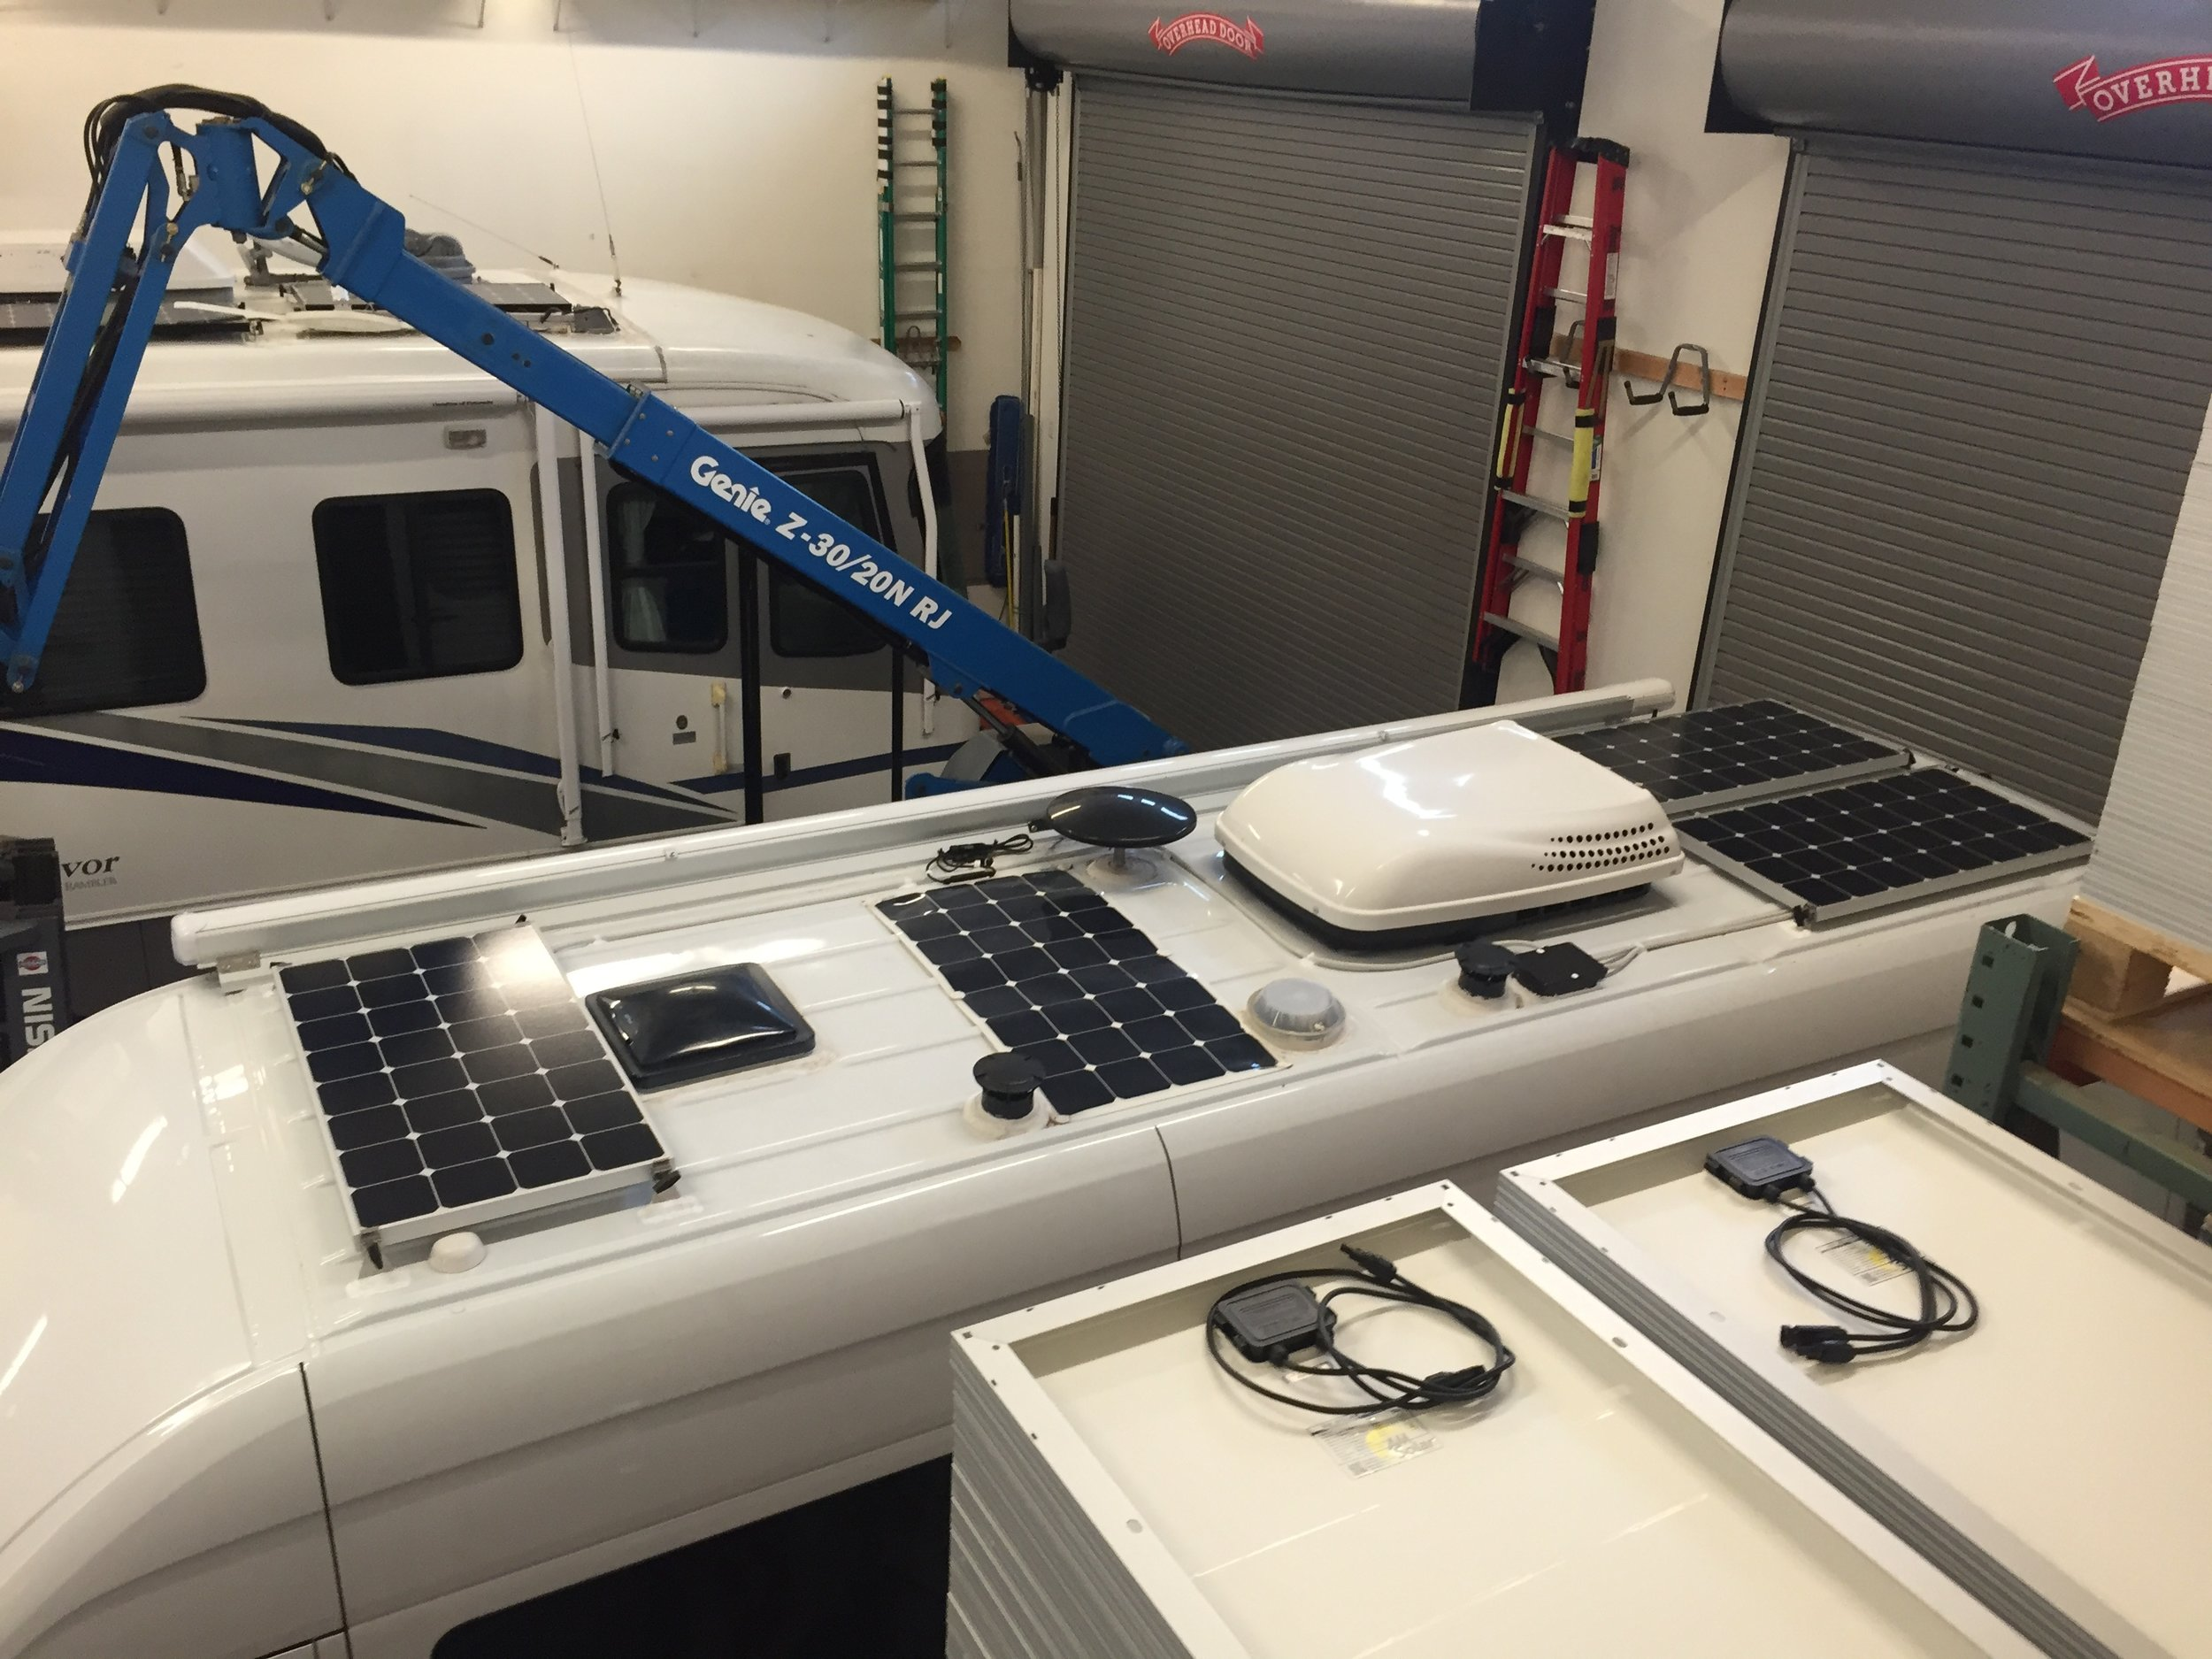 300W from AM Solar plus the original 100W flexible panel